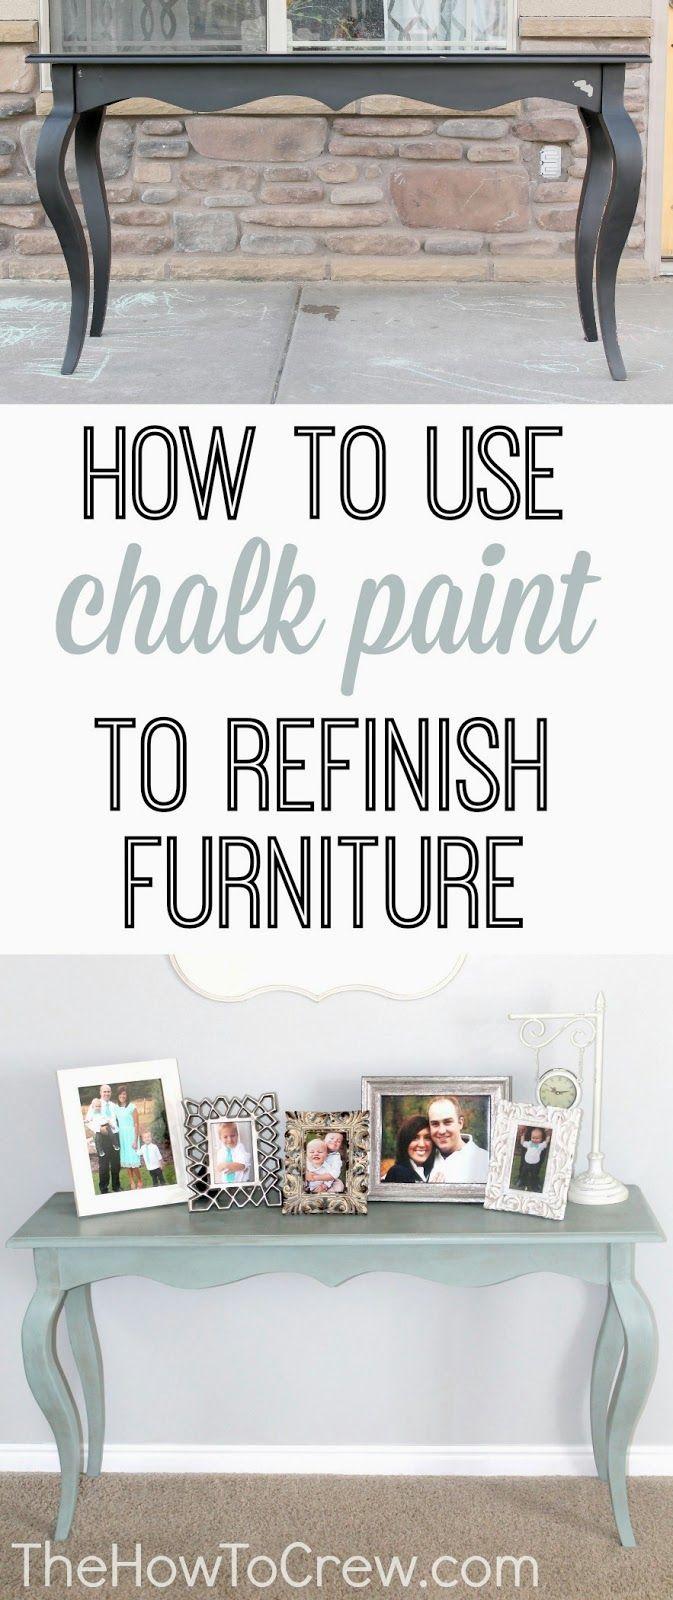 Best 25  Refinishing laminate furniture ideas on Pinterest   Painting  laminate furniture  Laminate furniture and Painting laminate dresser. Best 25  Refinishing laminate furniture ideas on Pinterest